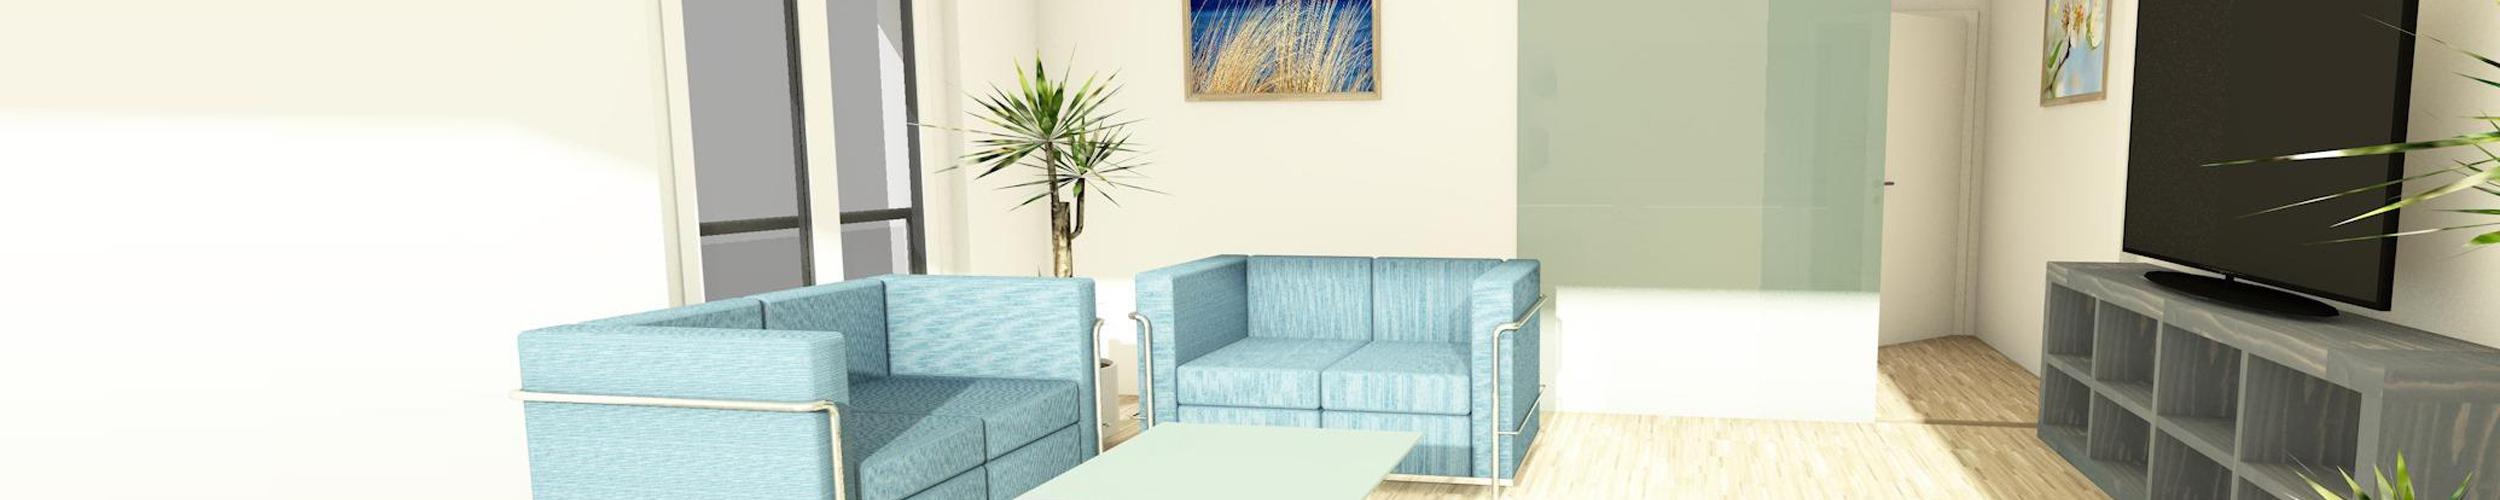 2 zimmer wohnung m llerstra e lippstadt 2 og rechts mieten bwg2punkt17. Black Bedroom Furniture Sets. Home Design Ideas